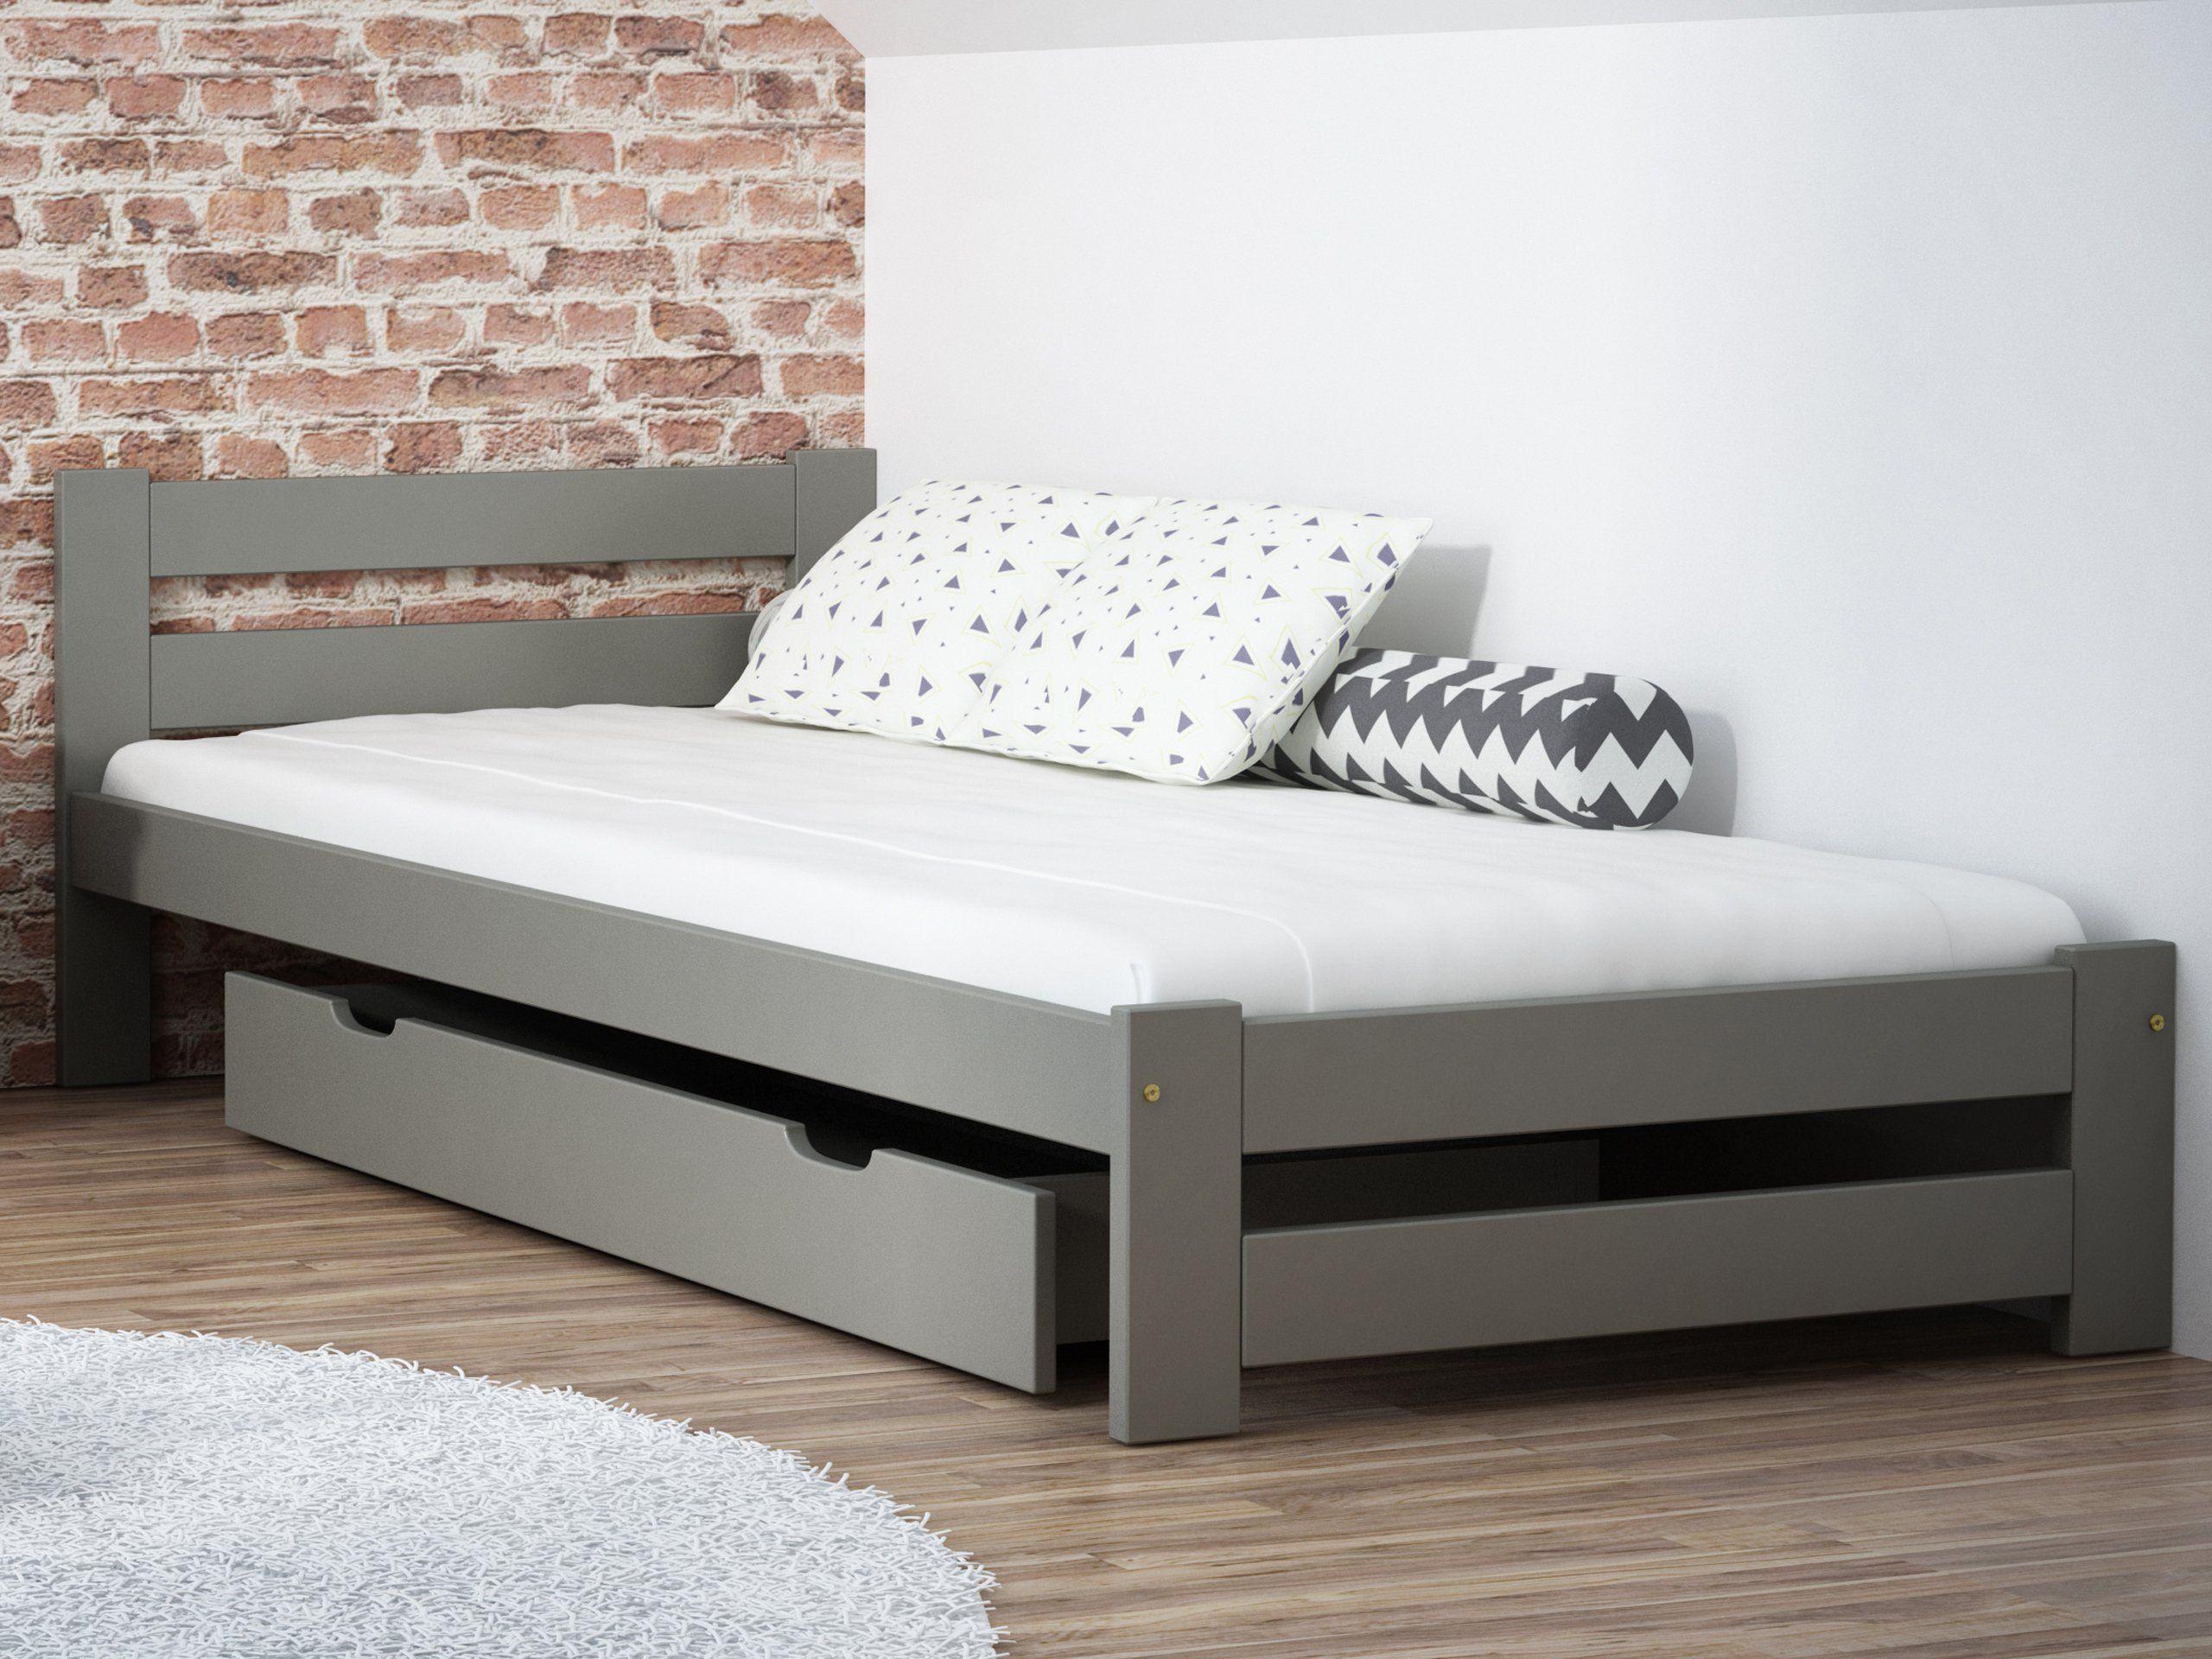 Lozko Szare Kada 90x200 Stelaz Materac Pianka Furniture Storage Bench Home Decor